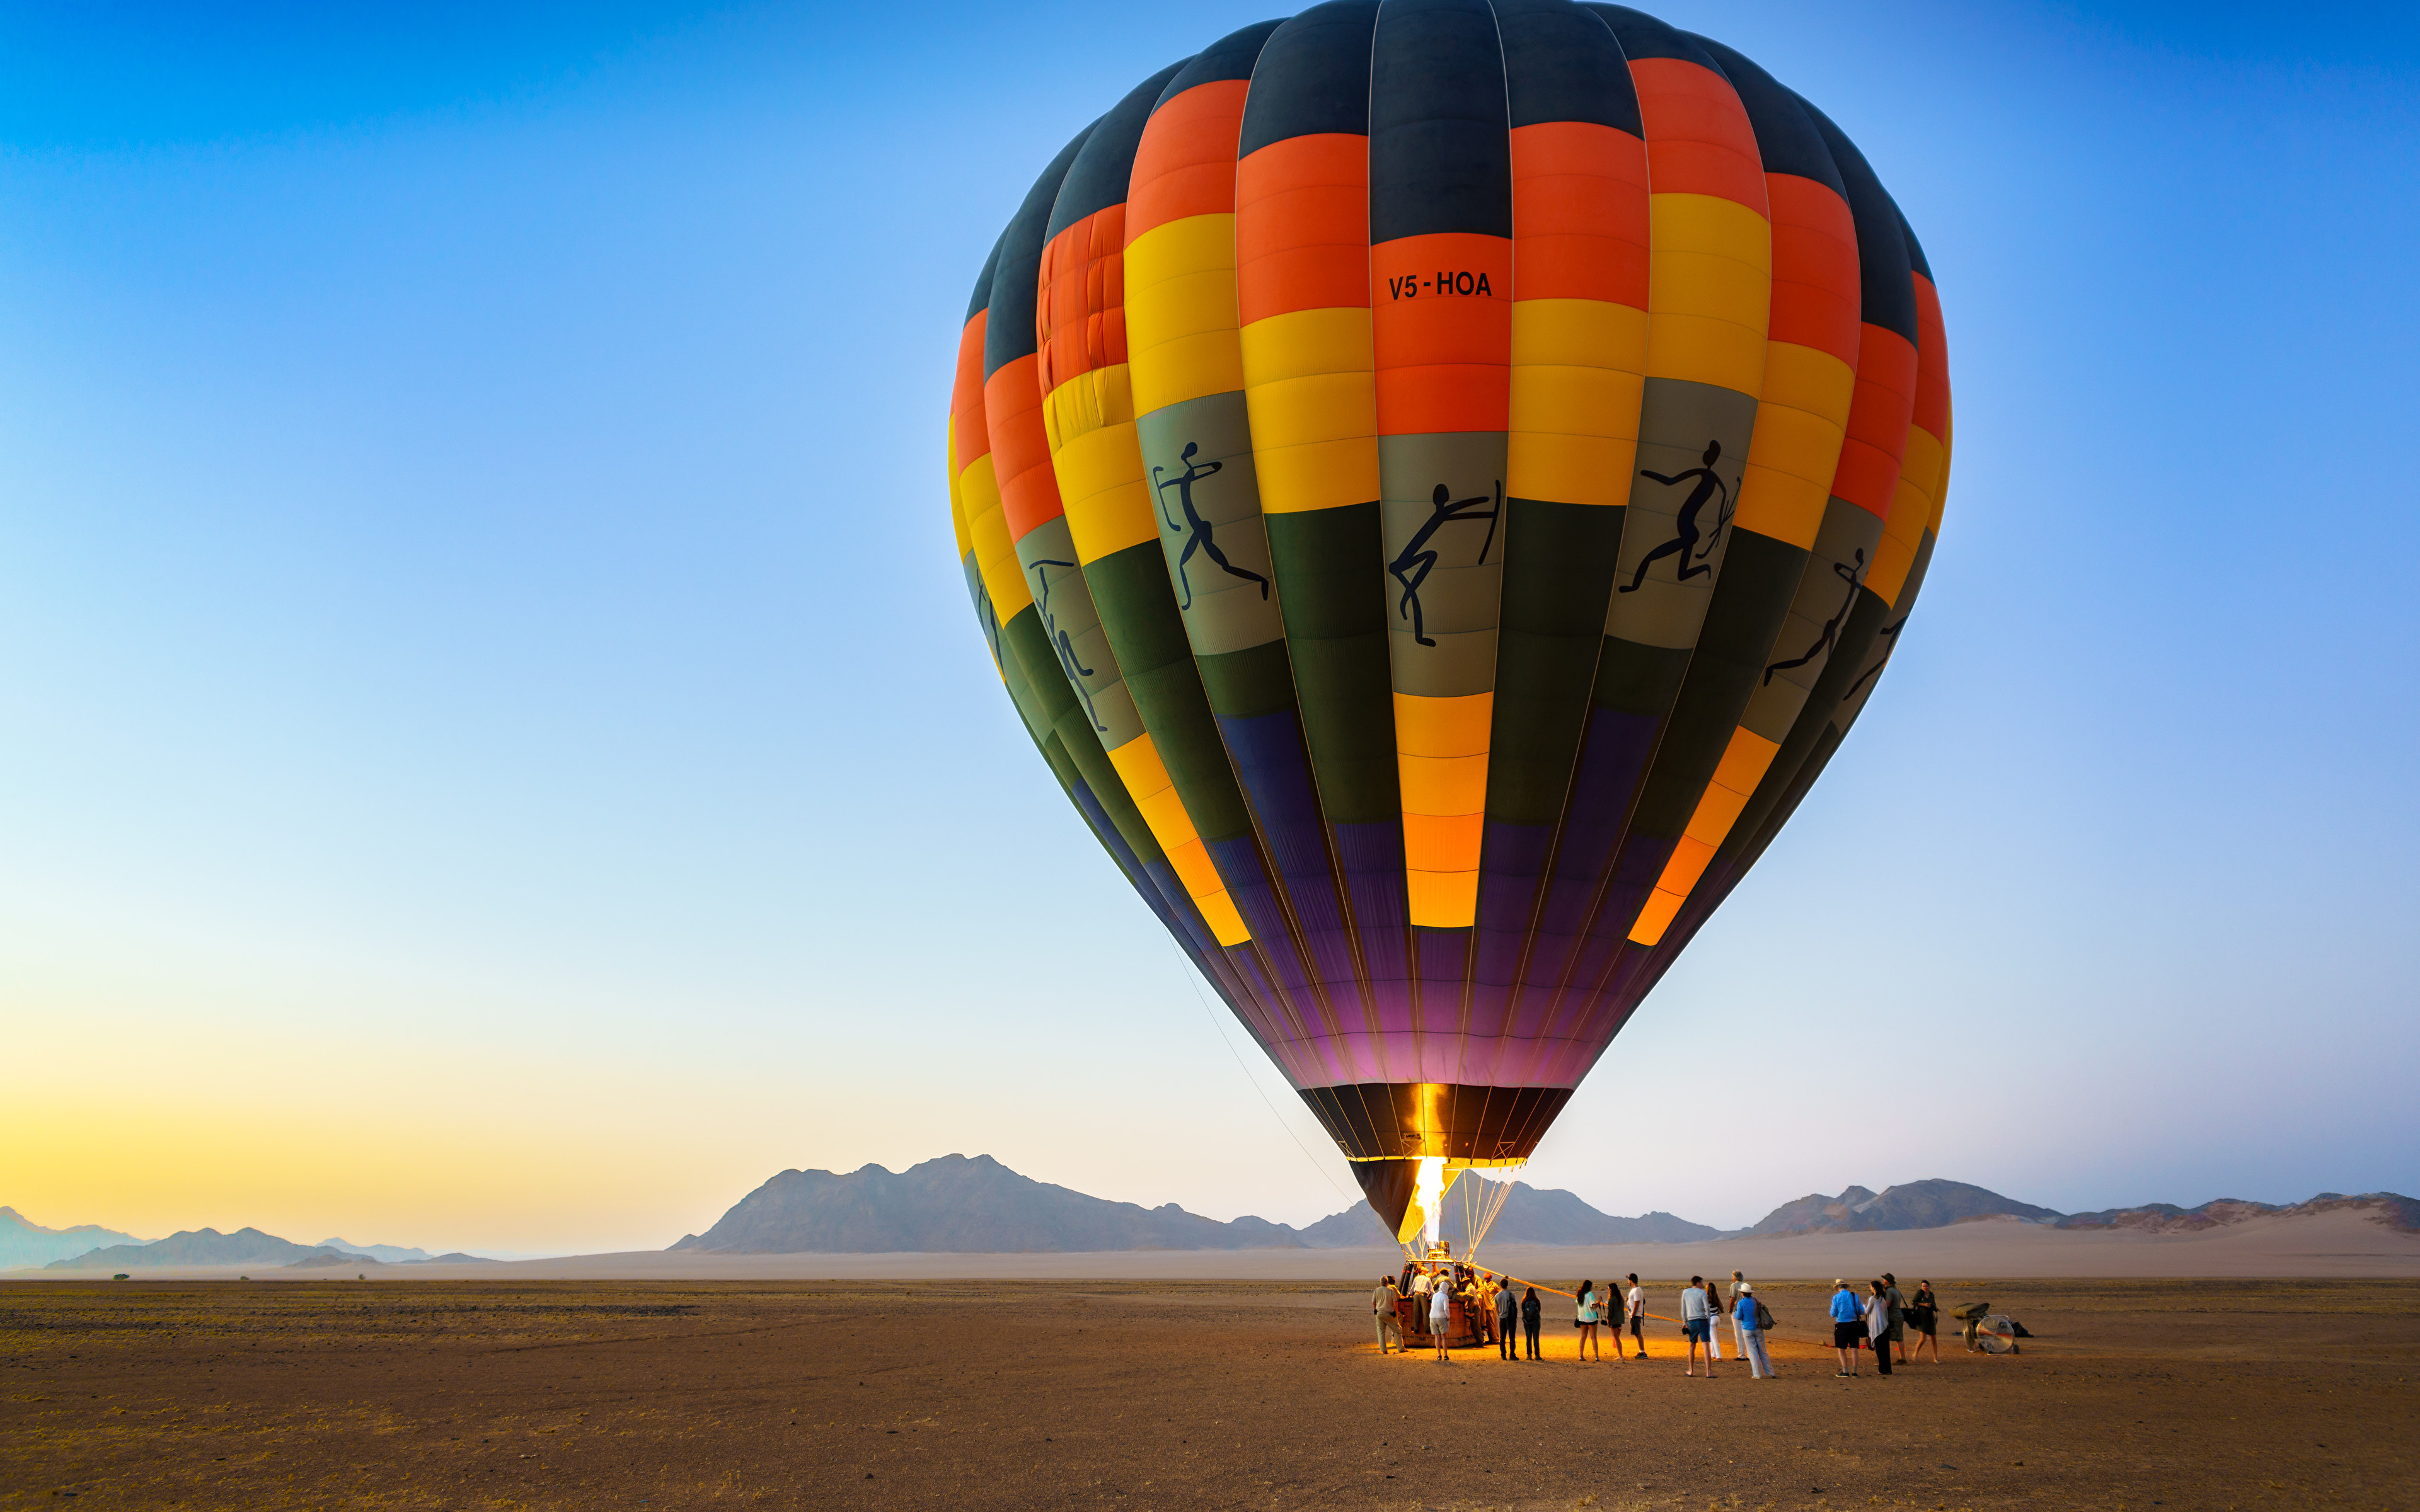 Картинки Африка аэростат Sossusvlei, Namib-Naukluft National Park, Namibia Природа Небо 3840x2400 Воздушный шар